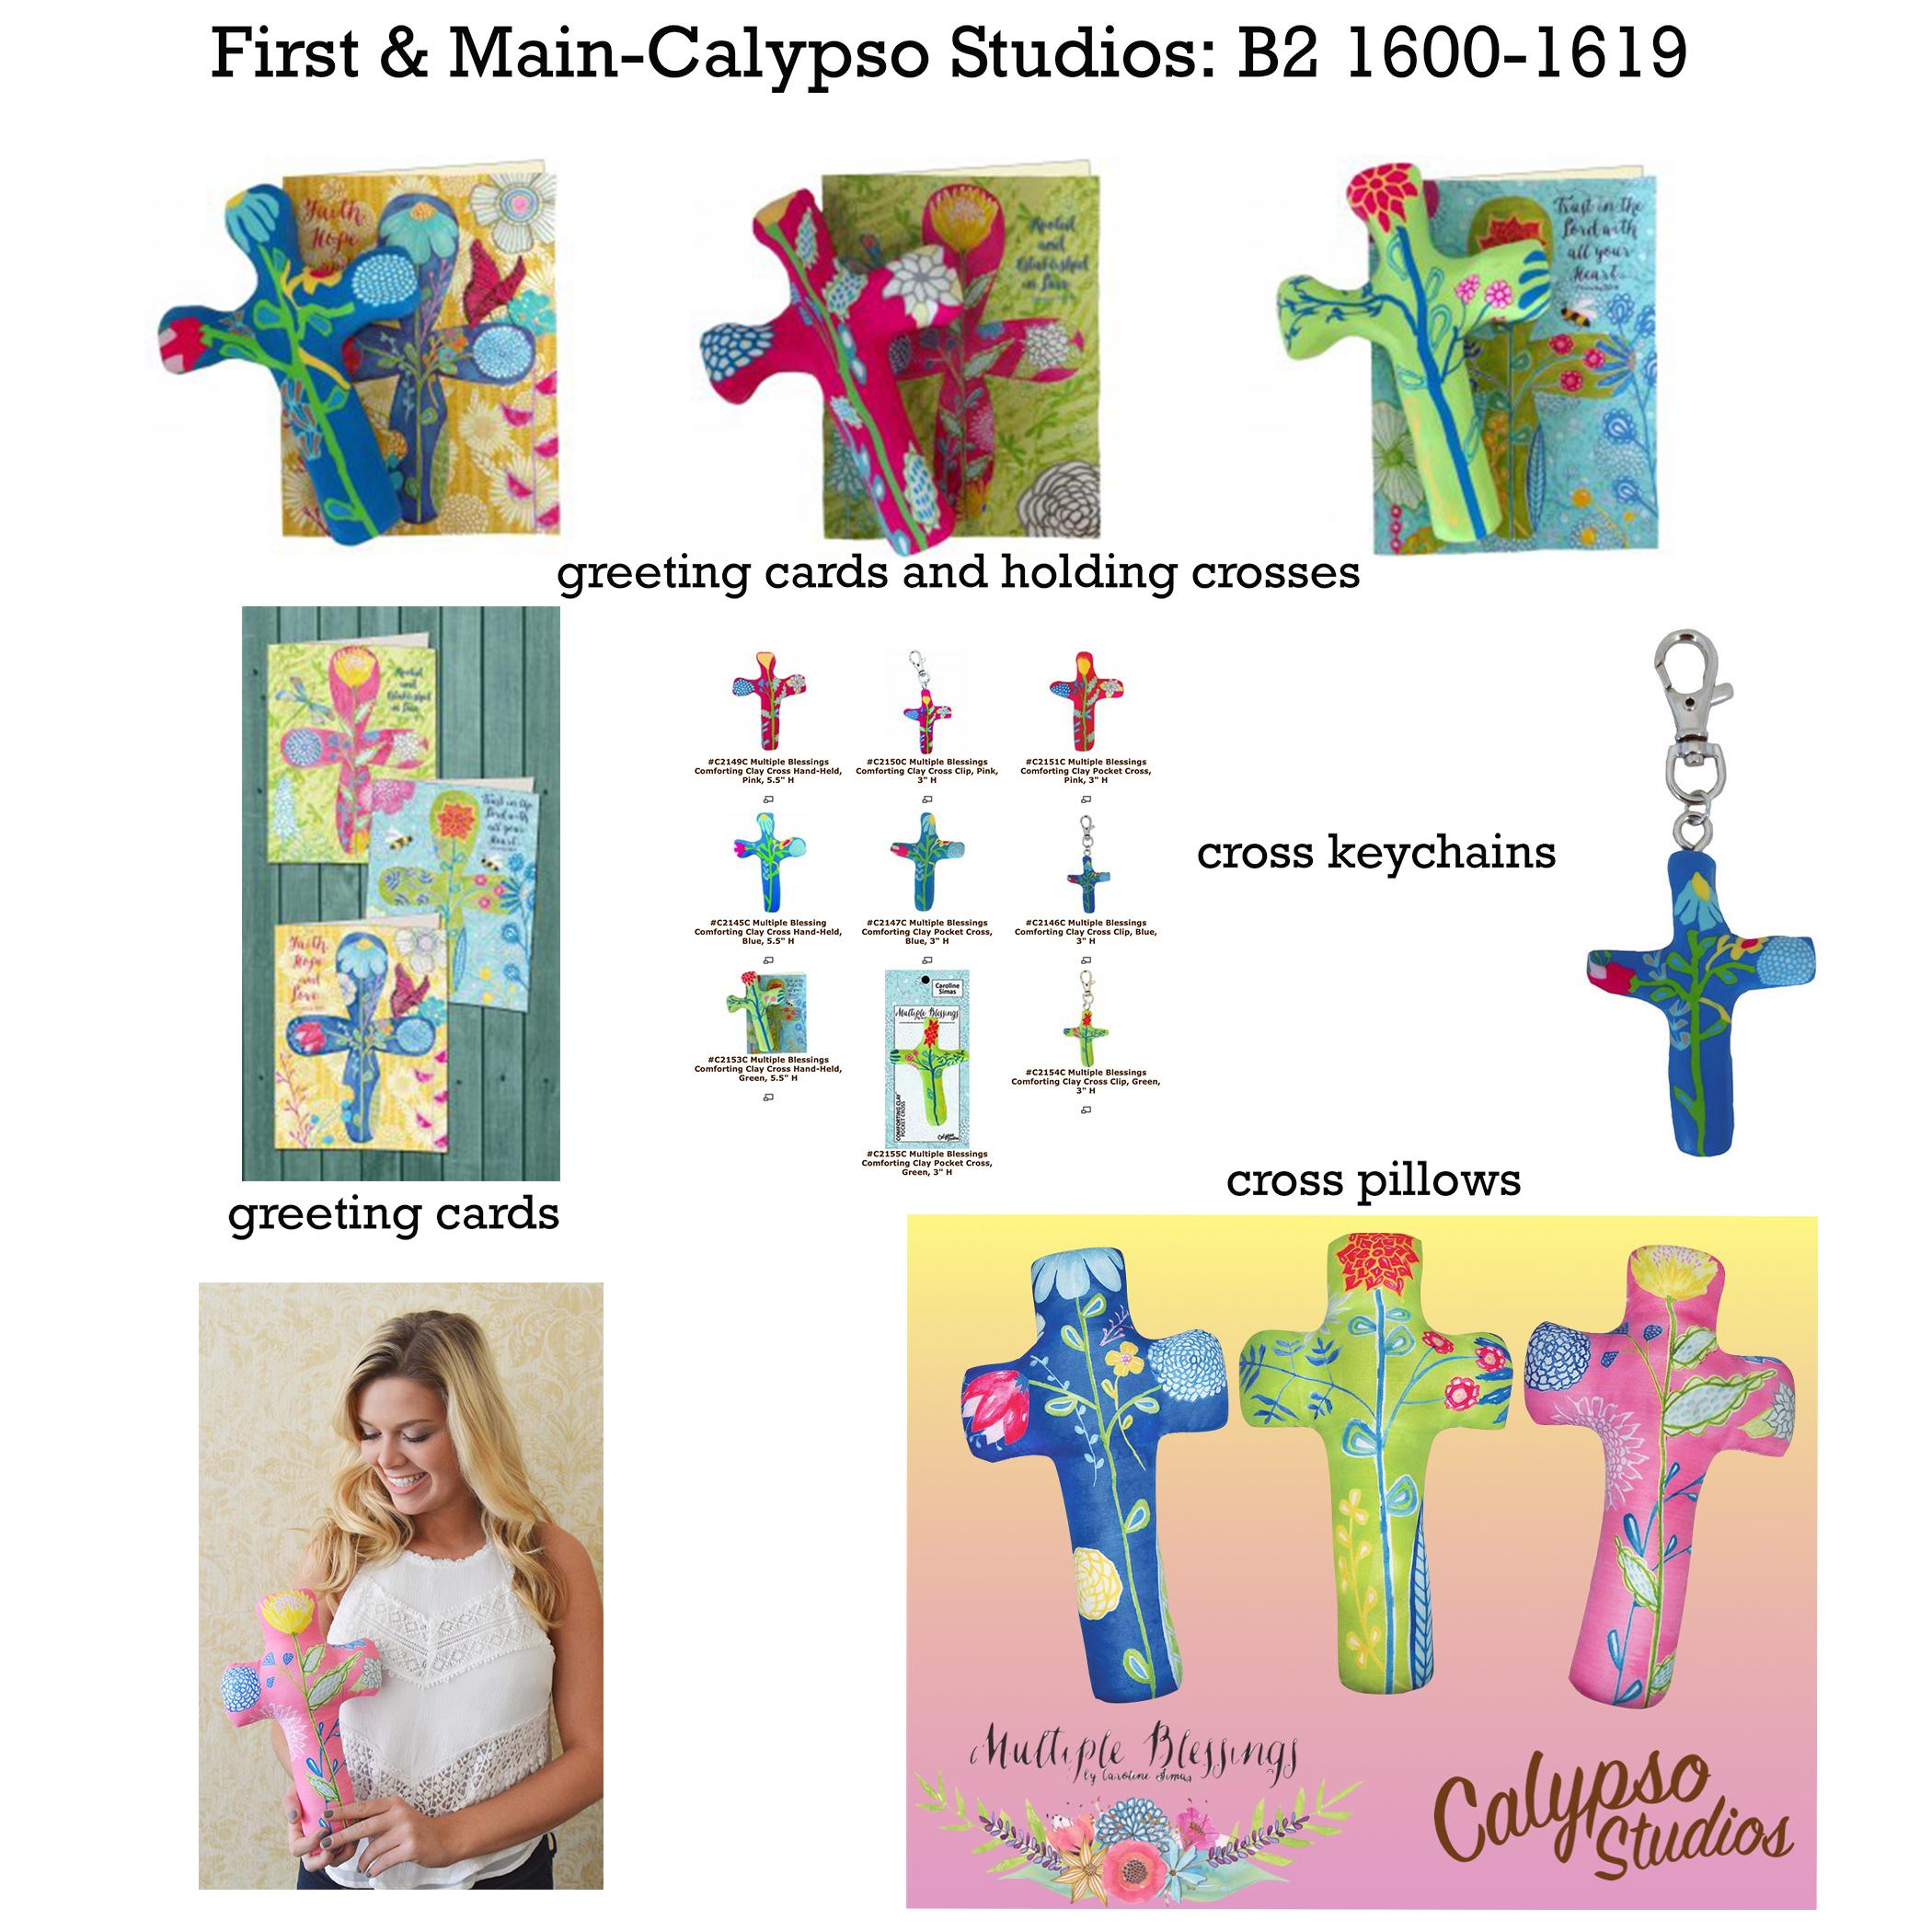 First & Main-Calypso.jpg